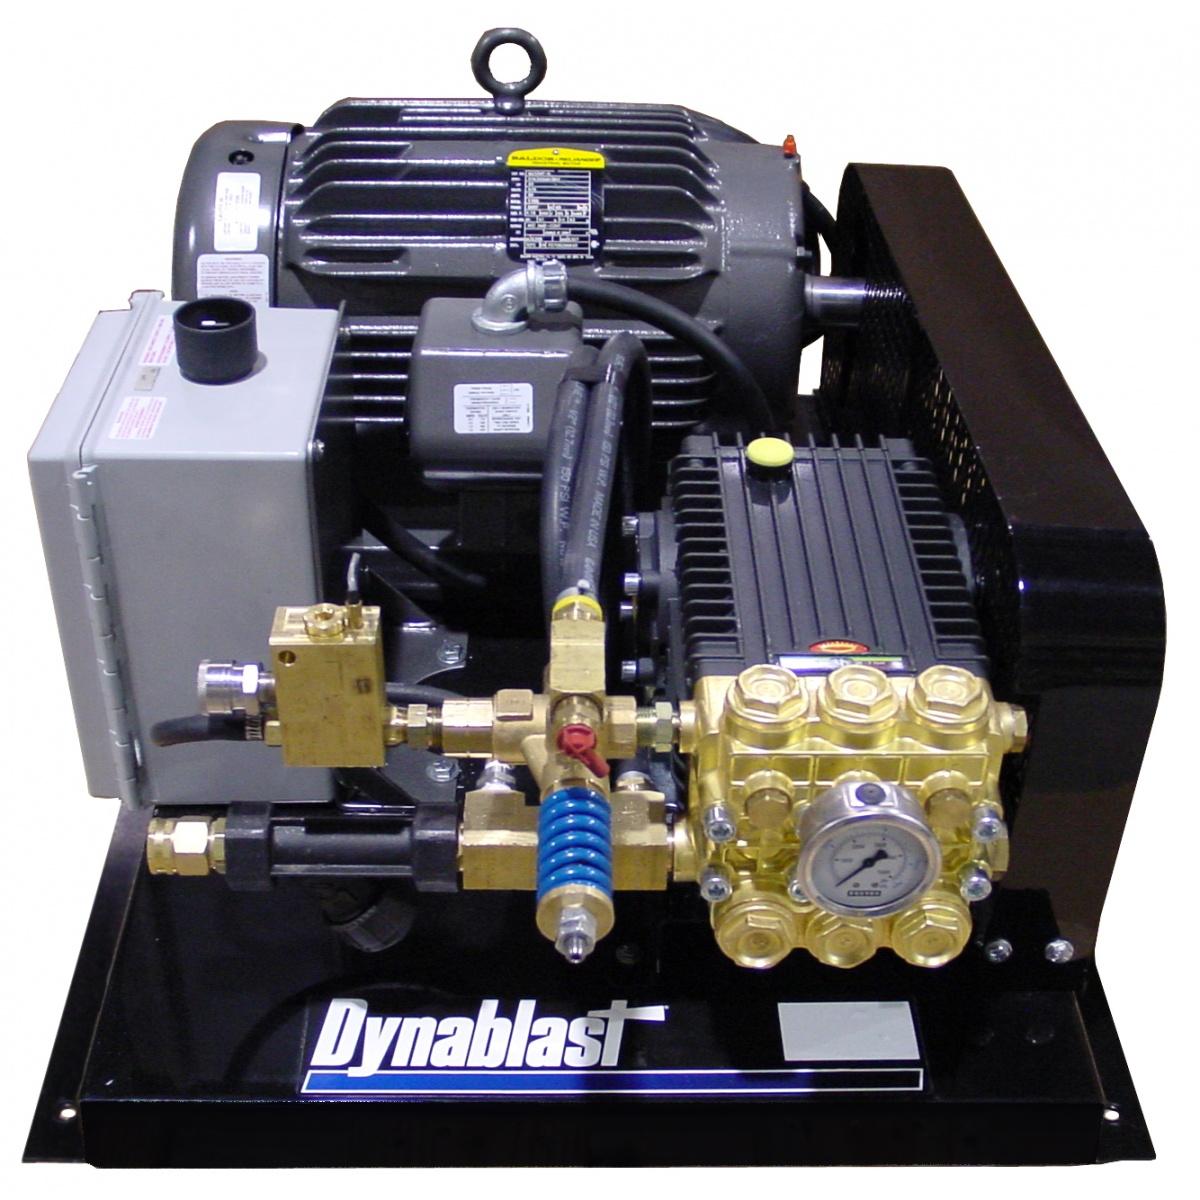 Dynablast MPUB550E3D Cold Water Pressure Washer